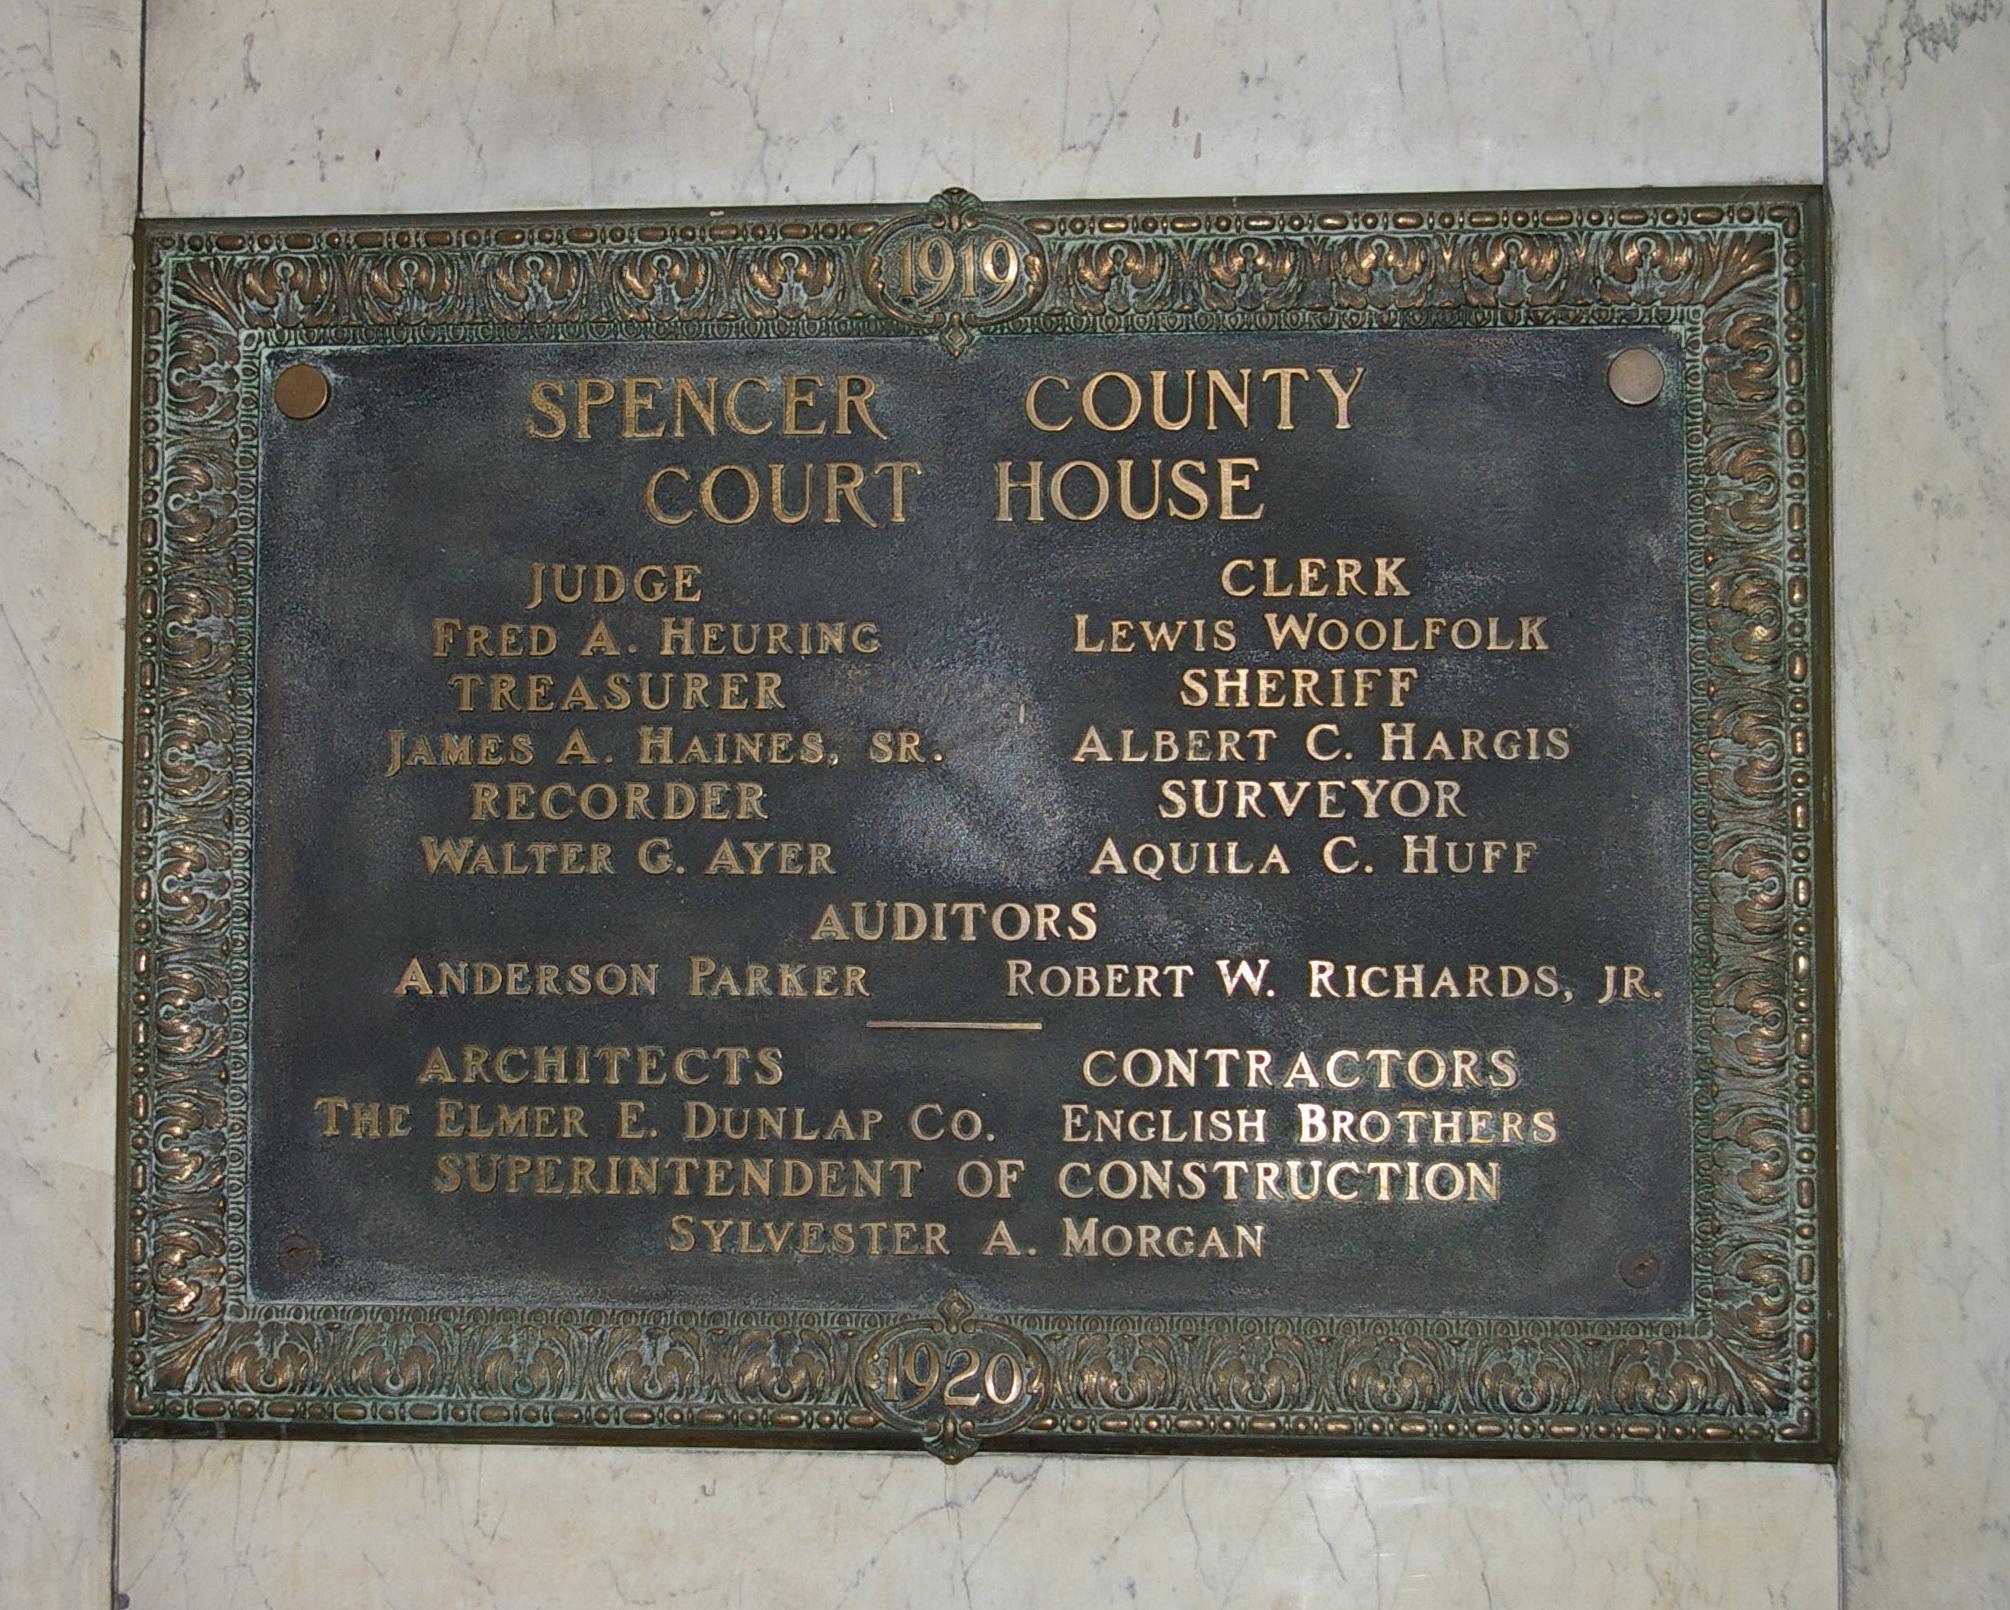 Indiana spencer county rockport - 1484i I08